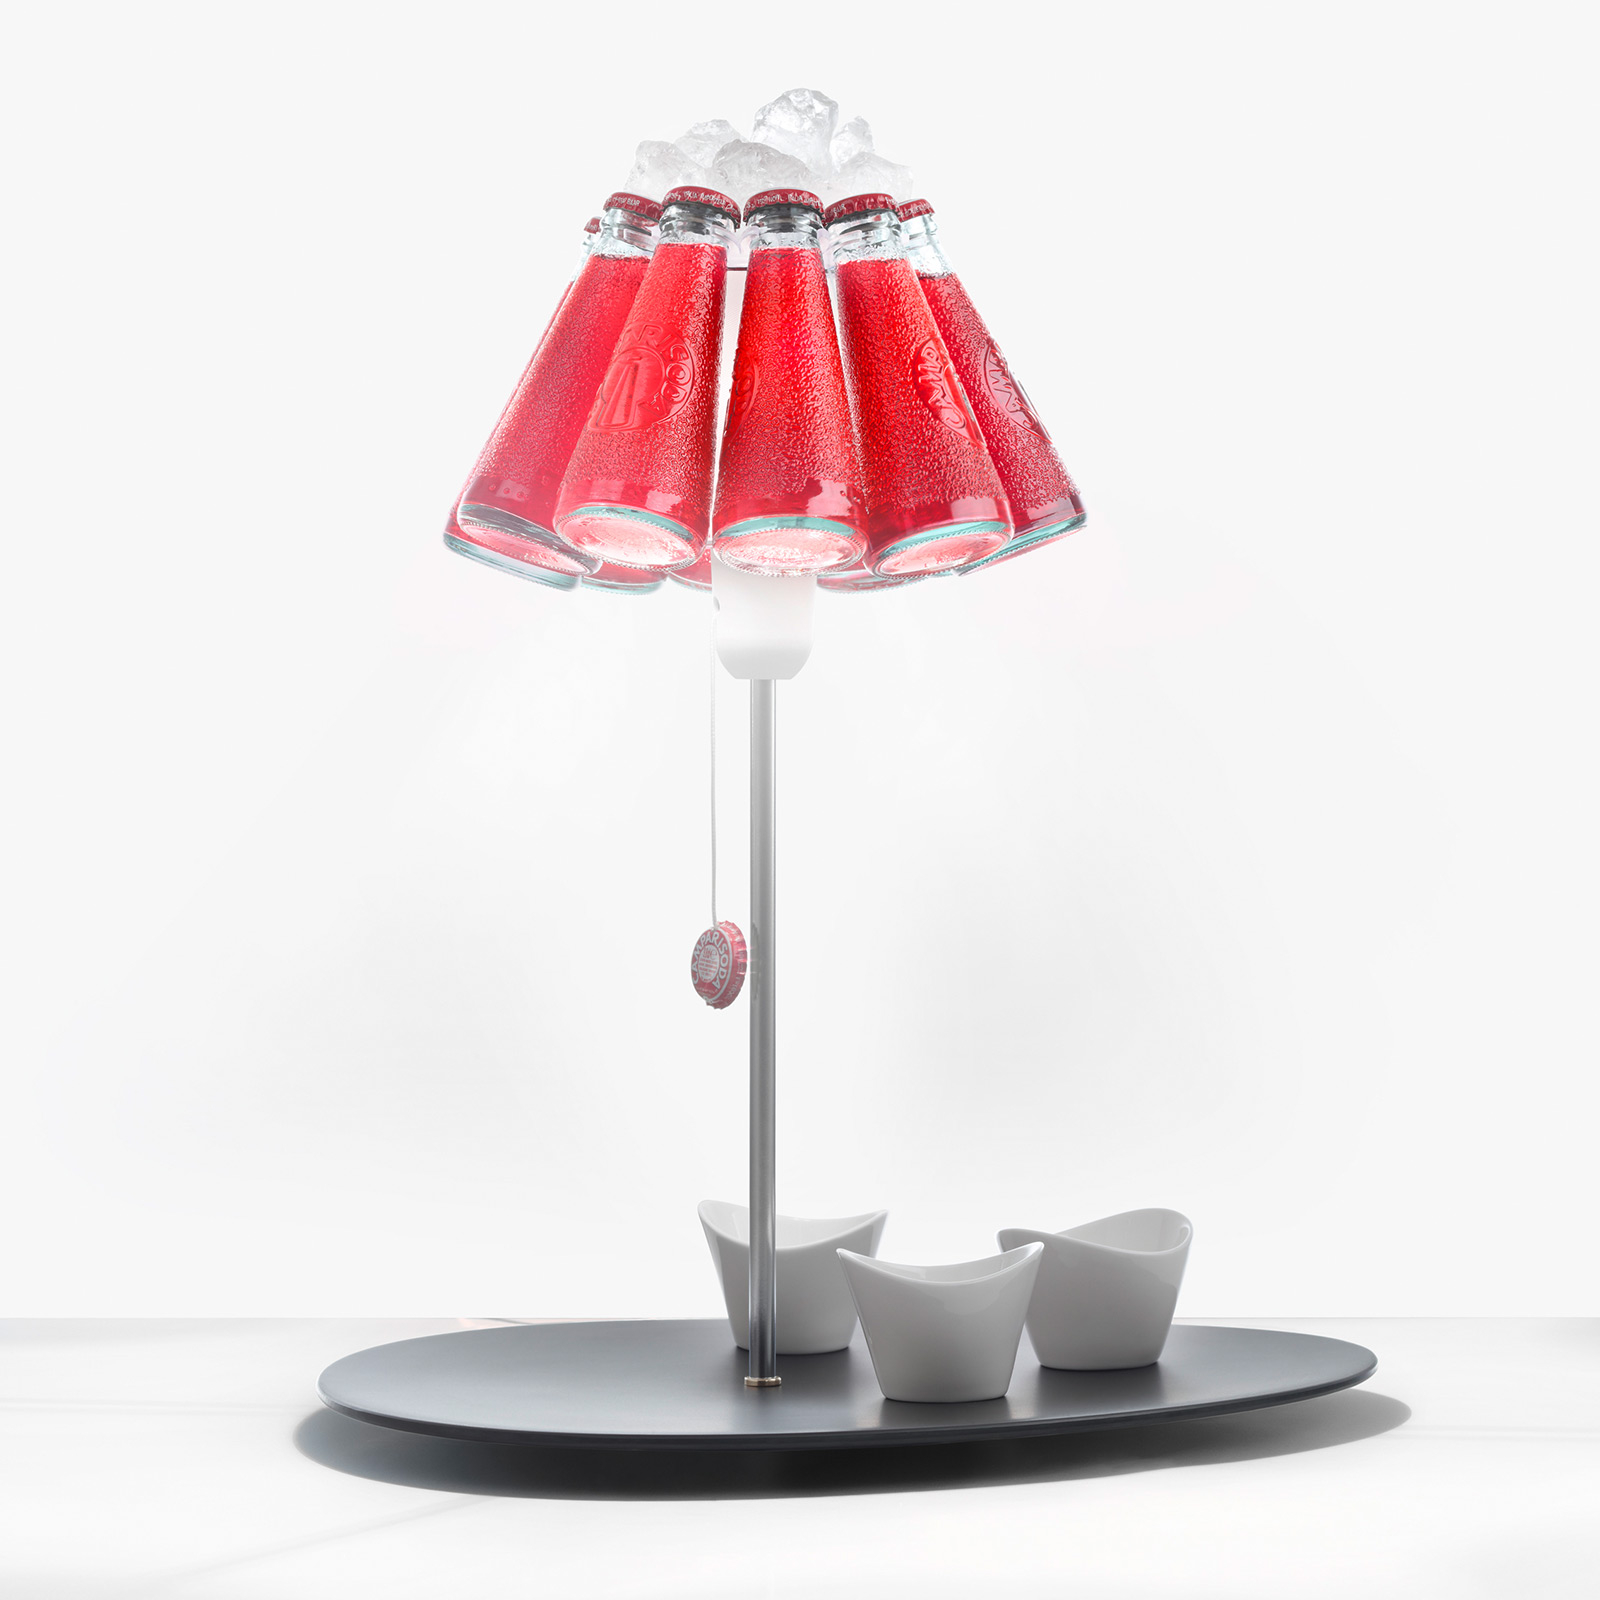 Ingo Maurer Campari Bar lampe à poser bouteilles